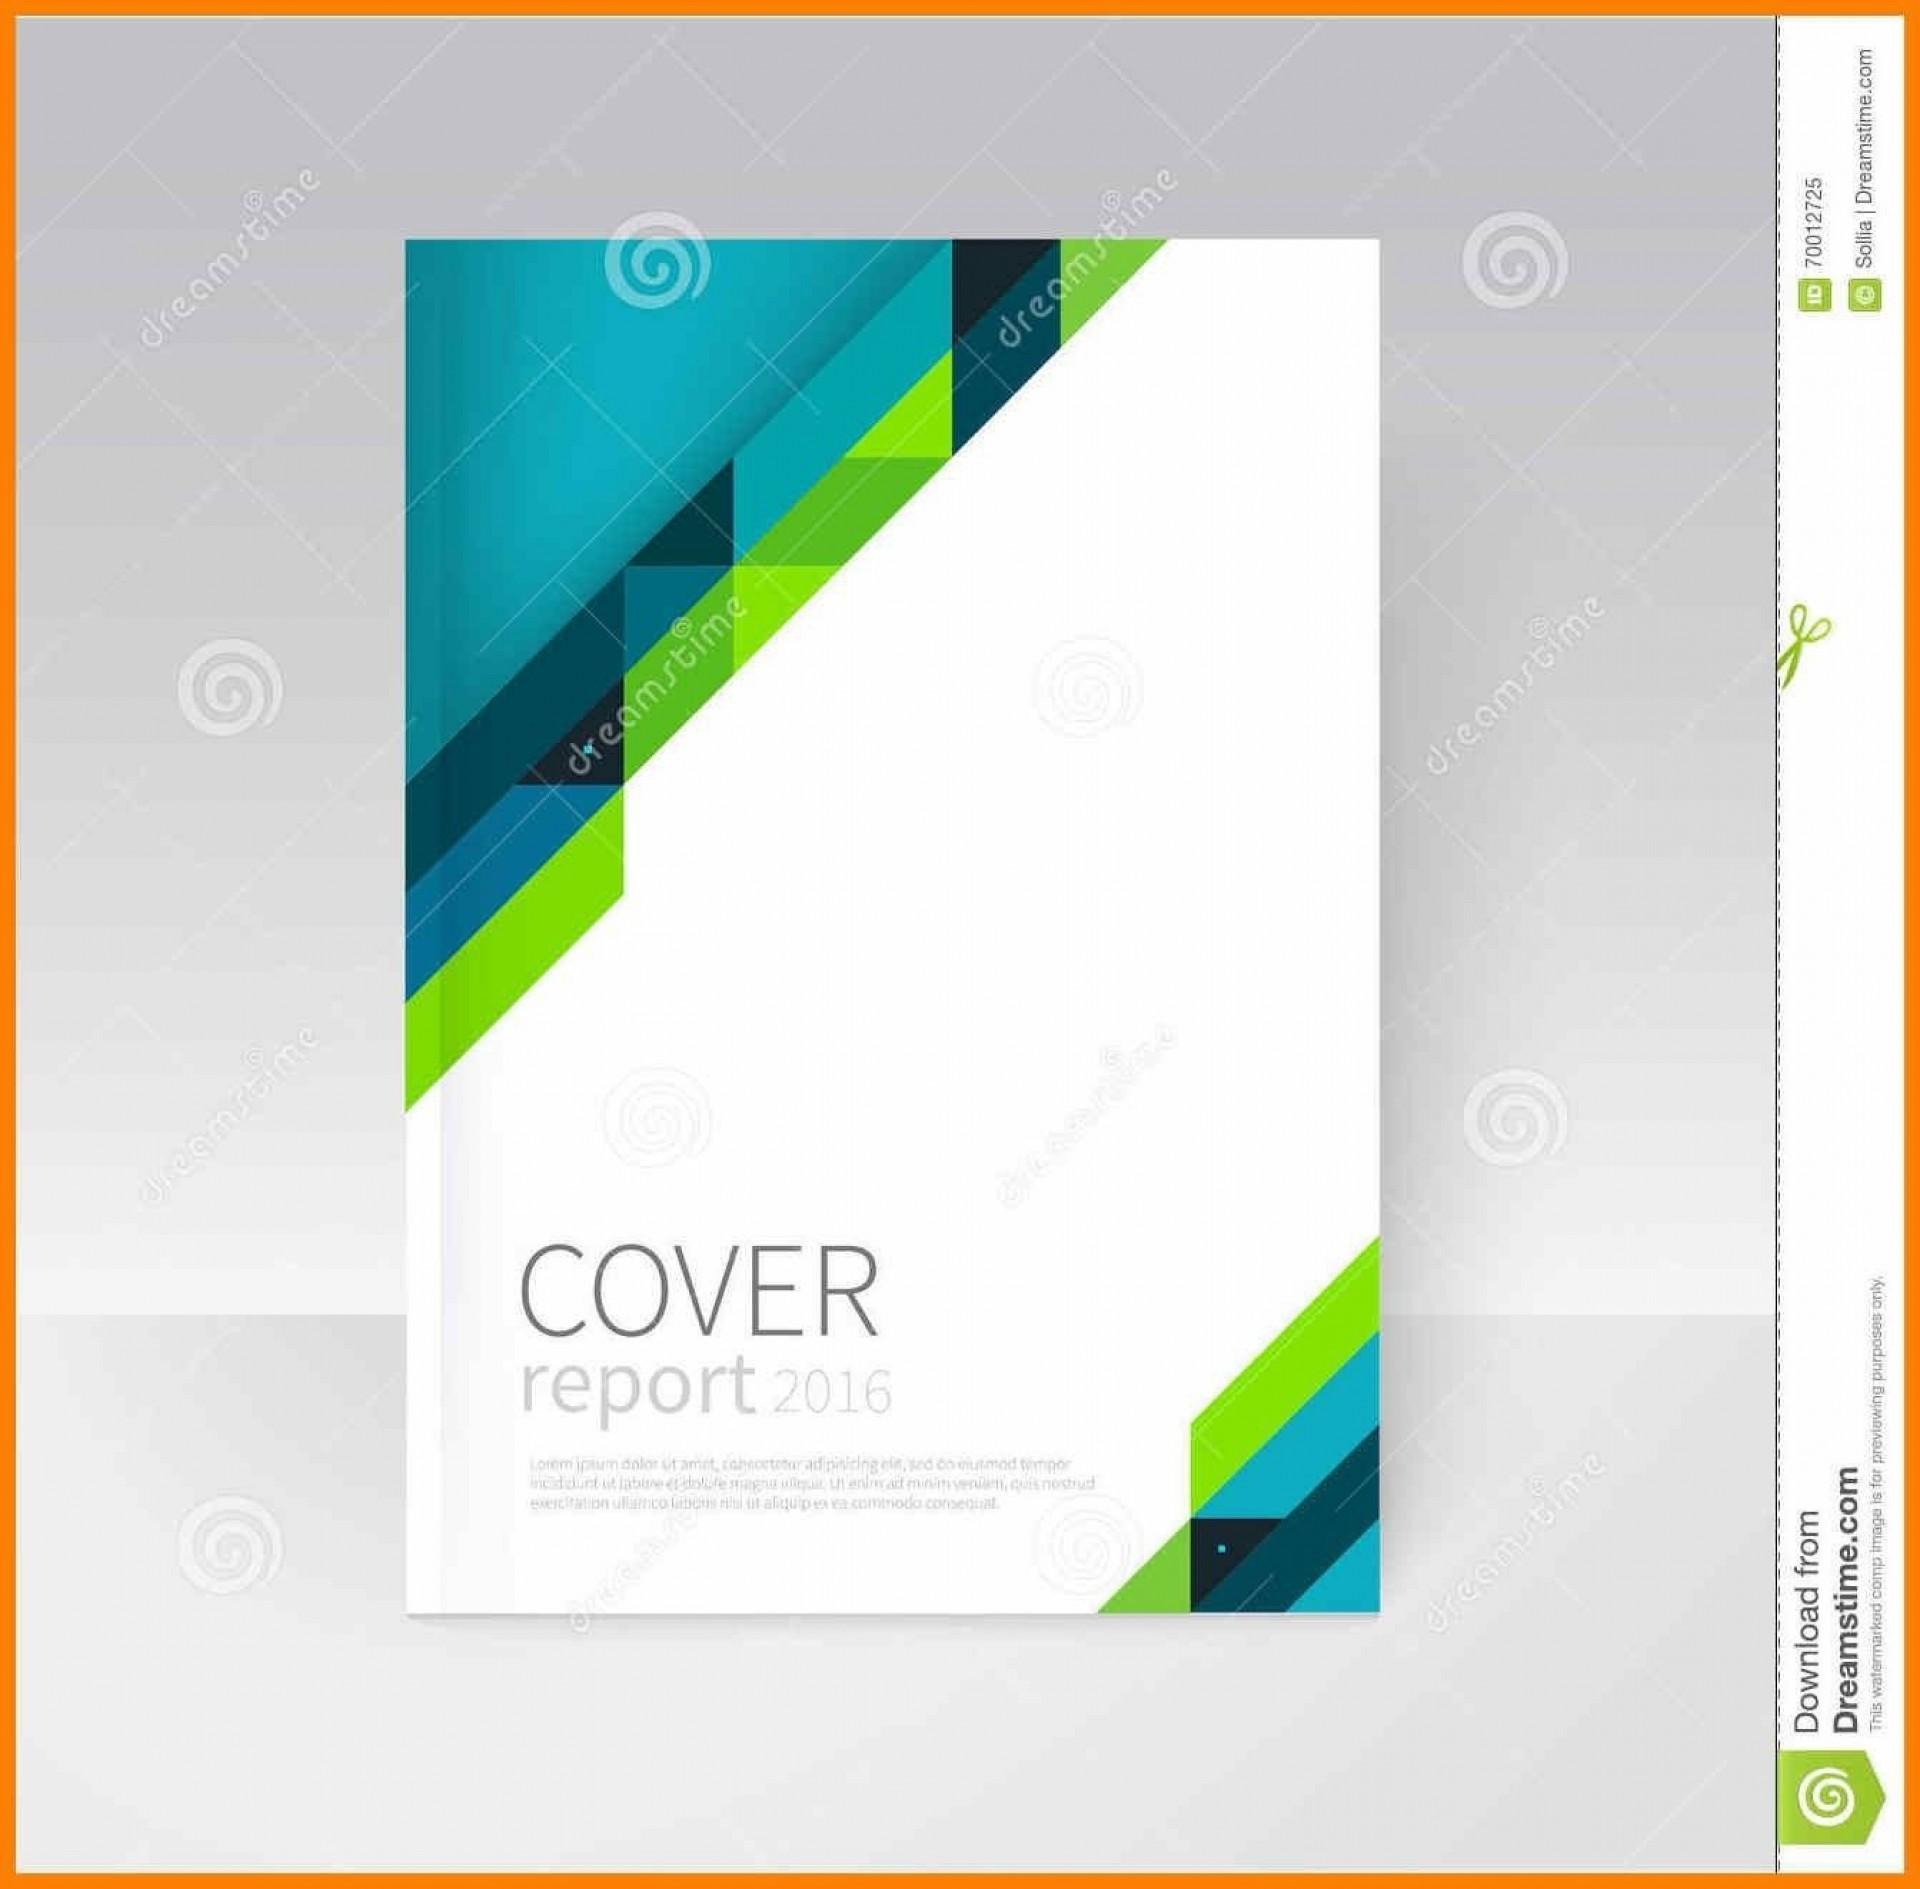 002 Wondrou Book Cover Template Free Download Sample  Illustrator Design Vector Illustration1920